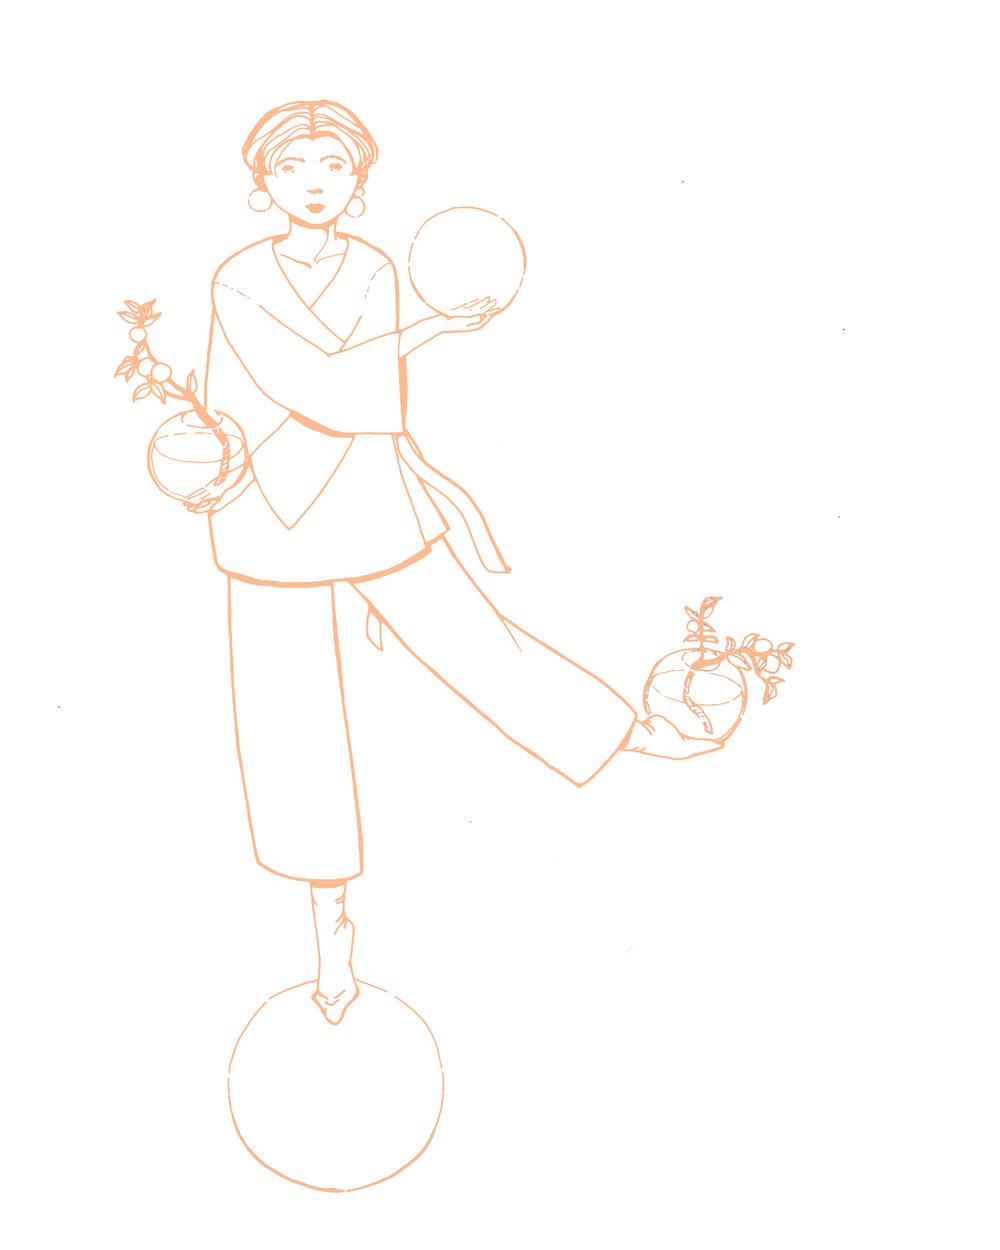 Libra illustration by Anna Mäki-Jyllilä, Inlacemedia Calendar